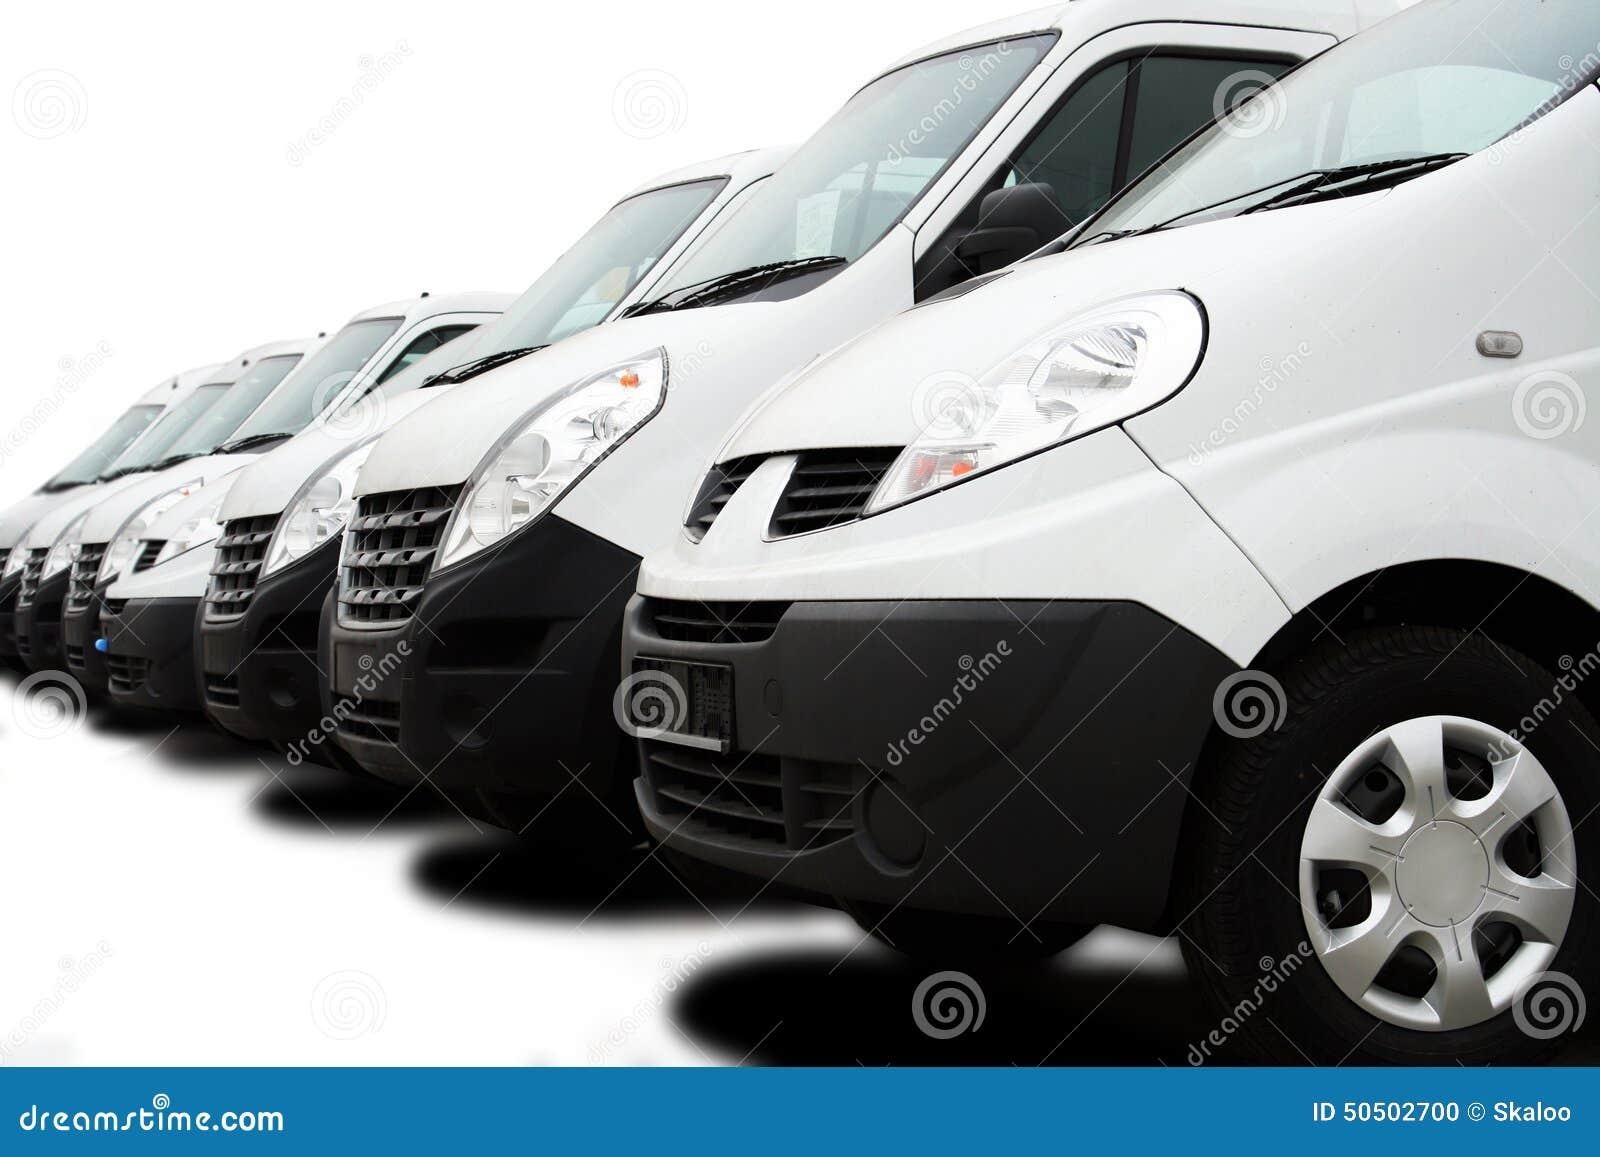 Vloot van bestelwagens